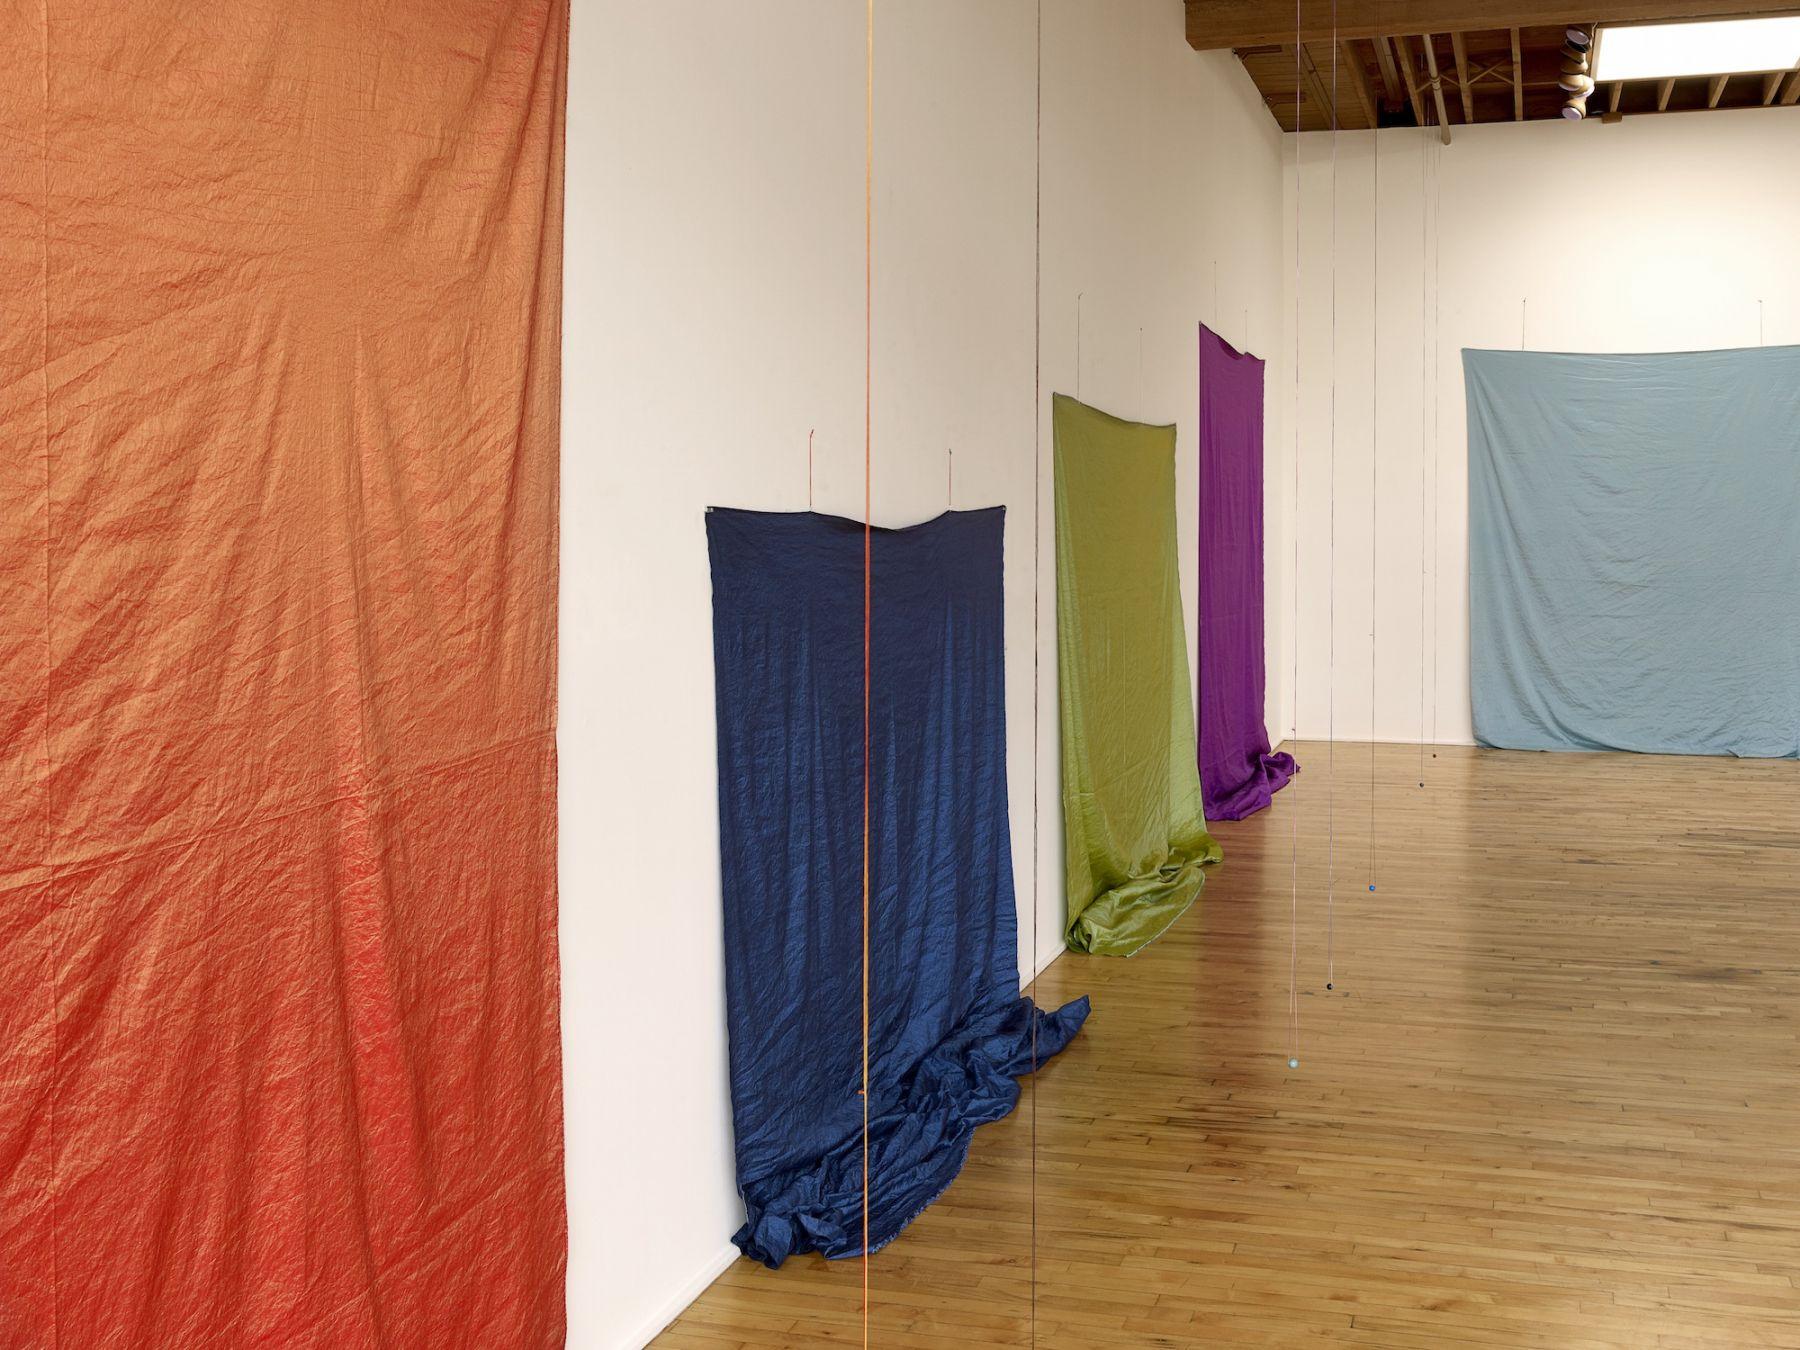 Polly Apfelbaum installation Locks Gallery